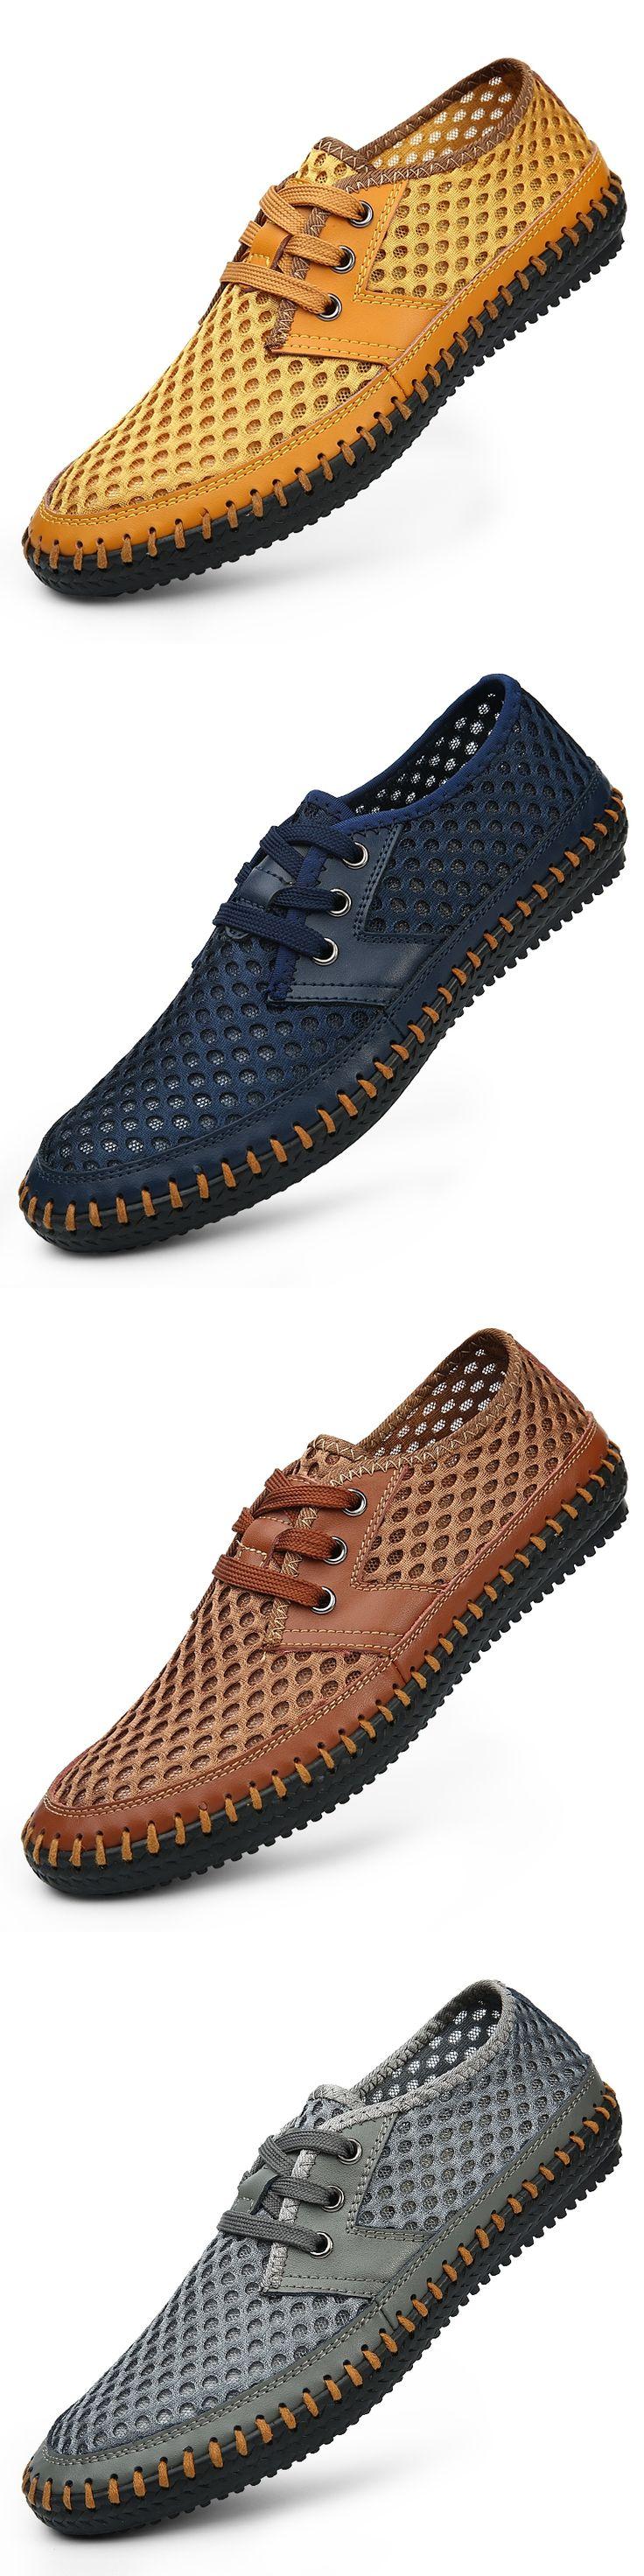 Men Sandals 2016 New Arrive Men'S Casual Sandals Super Breathable Skynet Lightweight Summer Shoes Breathable Mesh Men'S Sandals